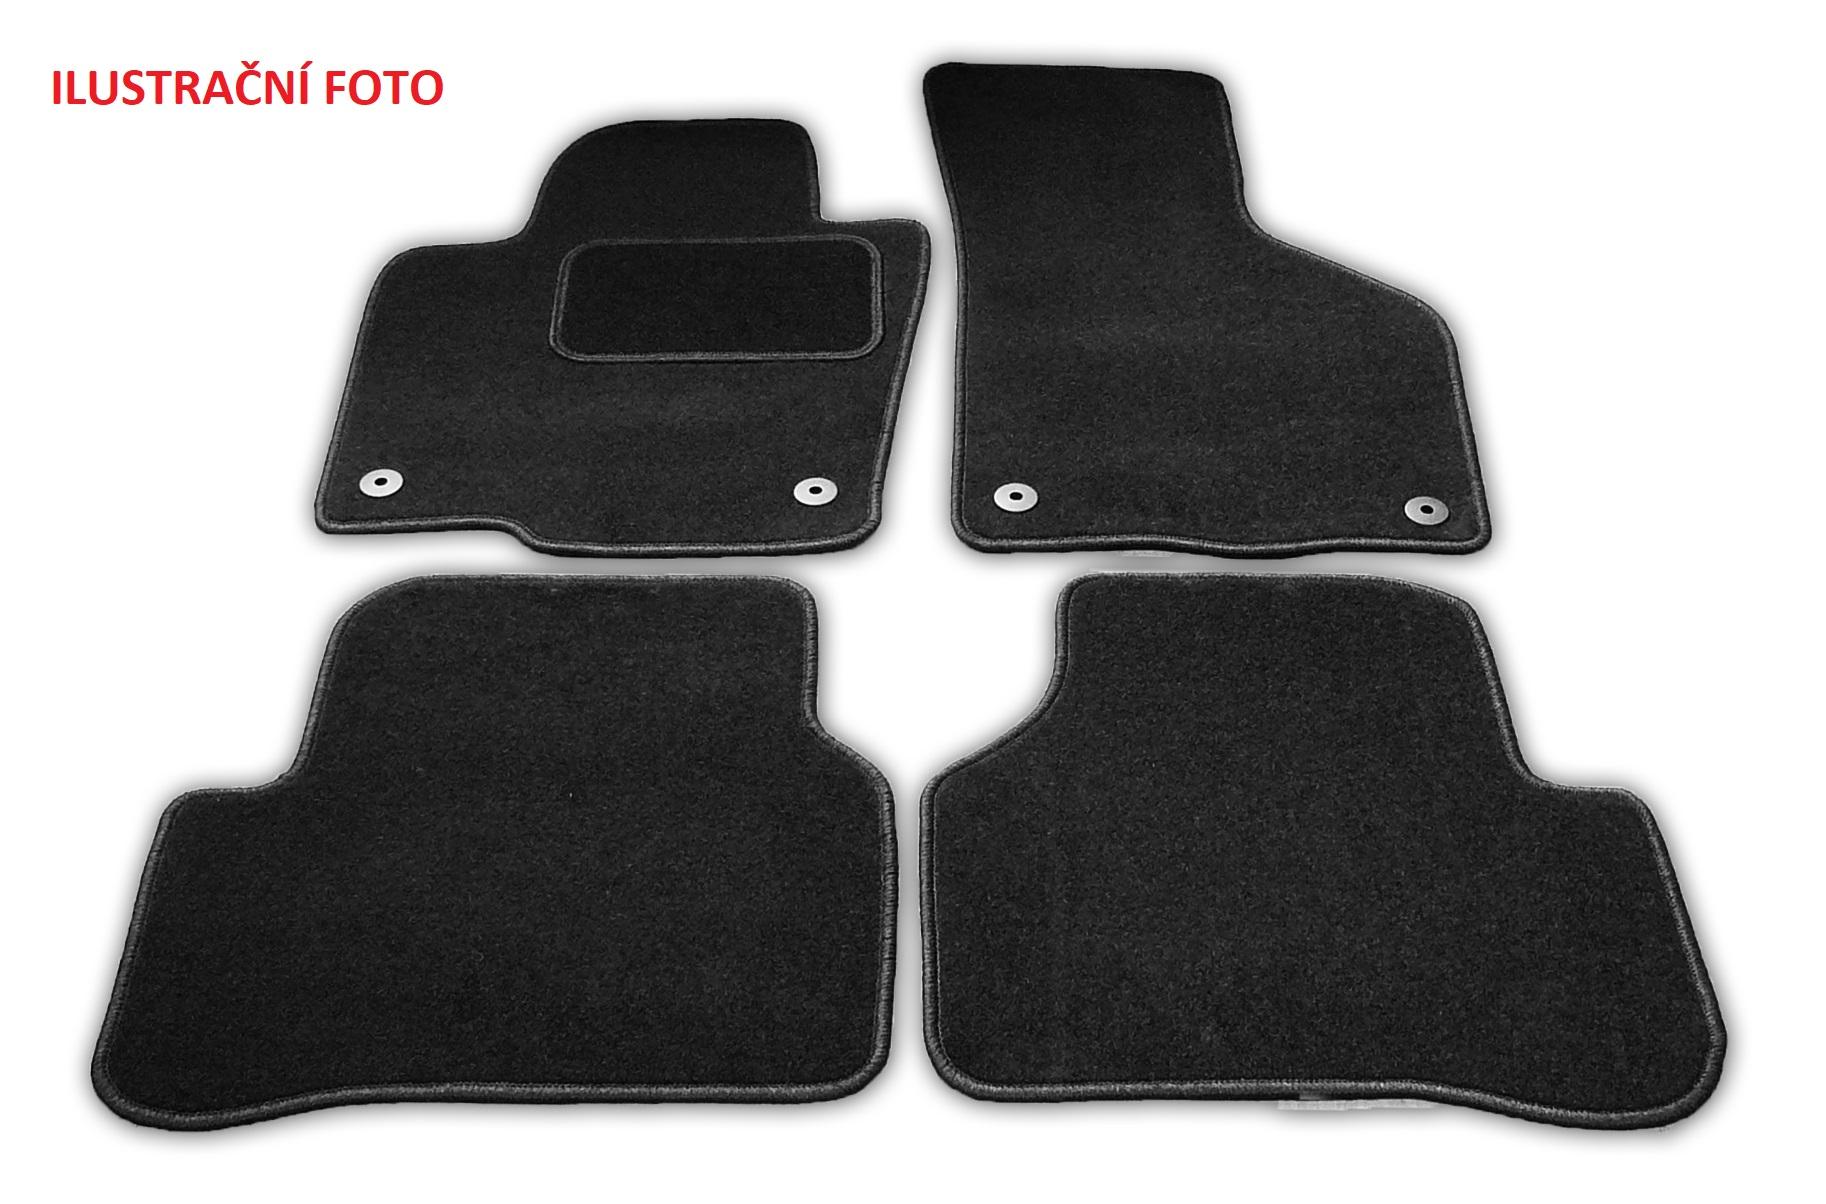 Automega Textilní autokoberce Standard BMW 3 F30/F31 2012-